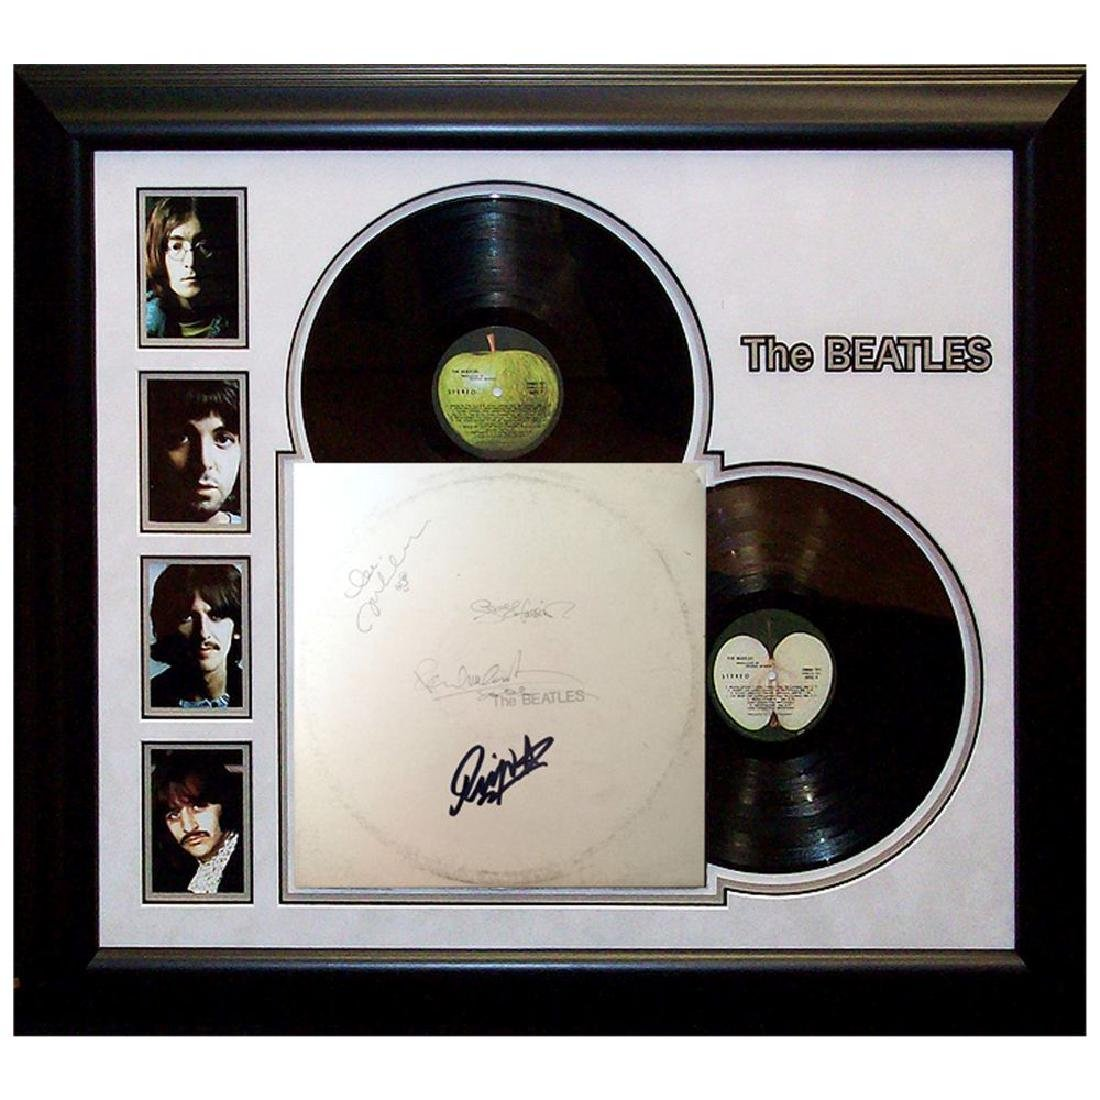 "The Beatles ""White"" Framed and Signed Album"